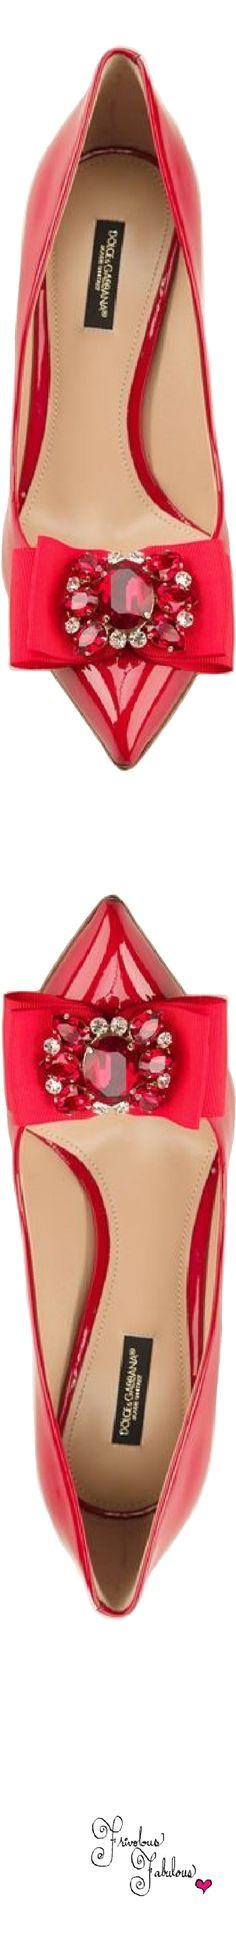 Frivolous Fabulous - Dolce & Gabbana Love